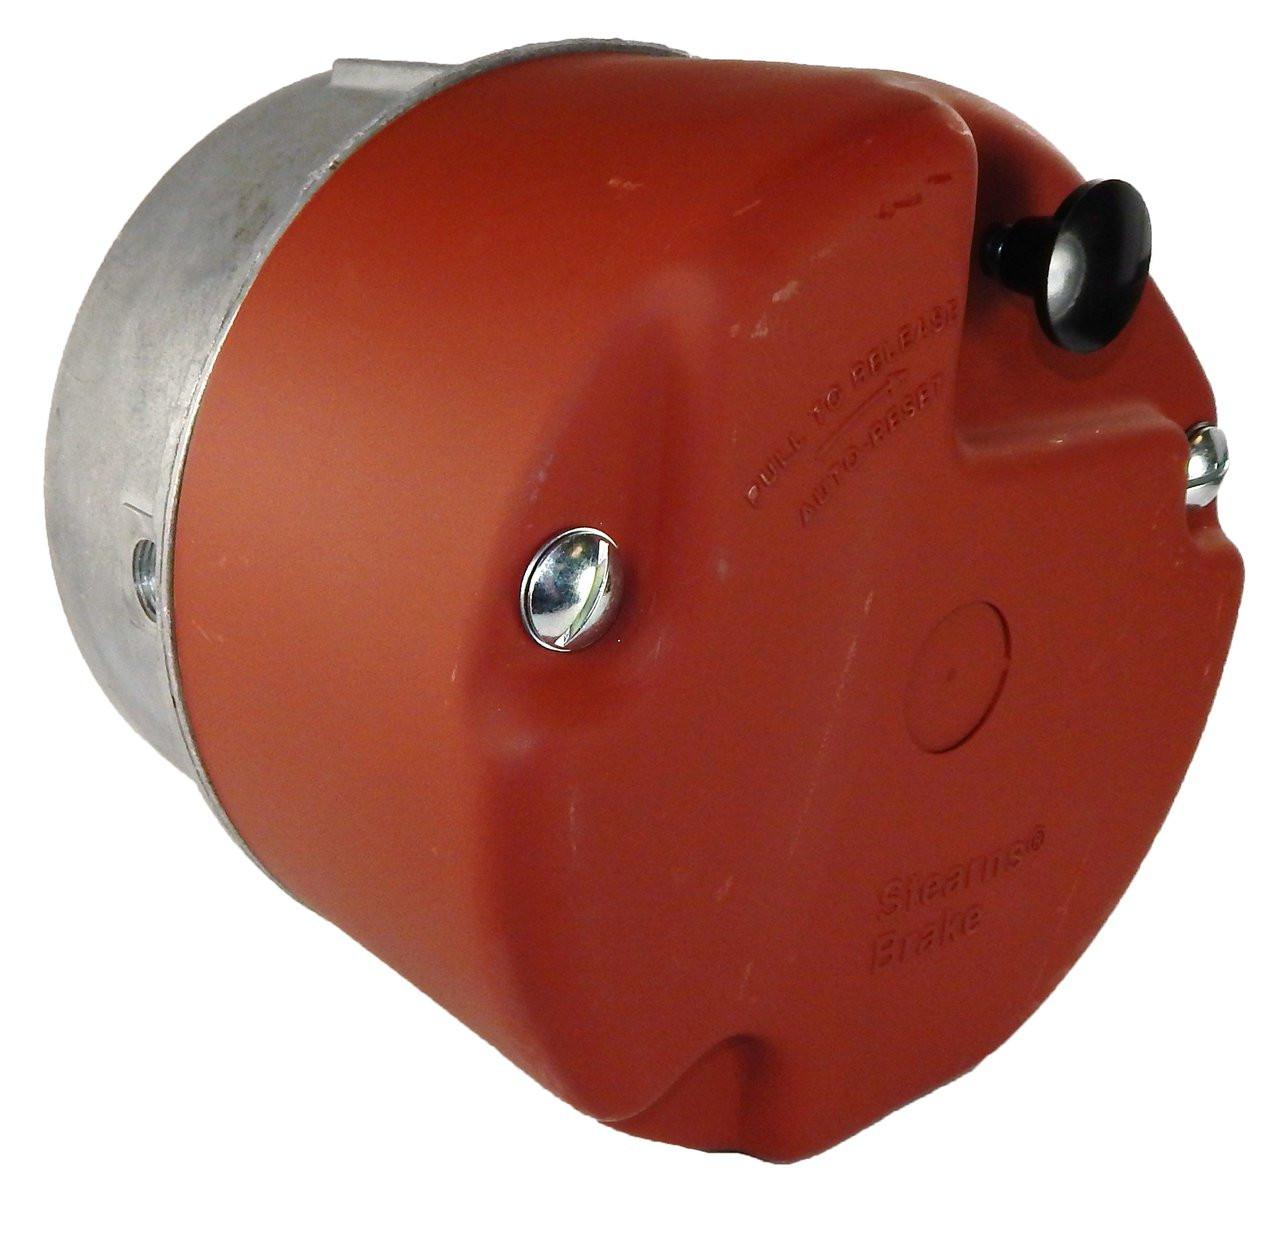 stearns brake coil wiring diagram 48 volt golf cart battery 1 087 081 00 eqf nema 2 208 230 460 3 phase